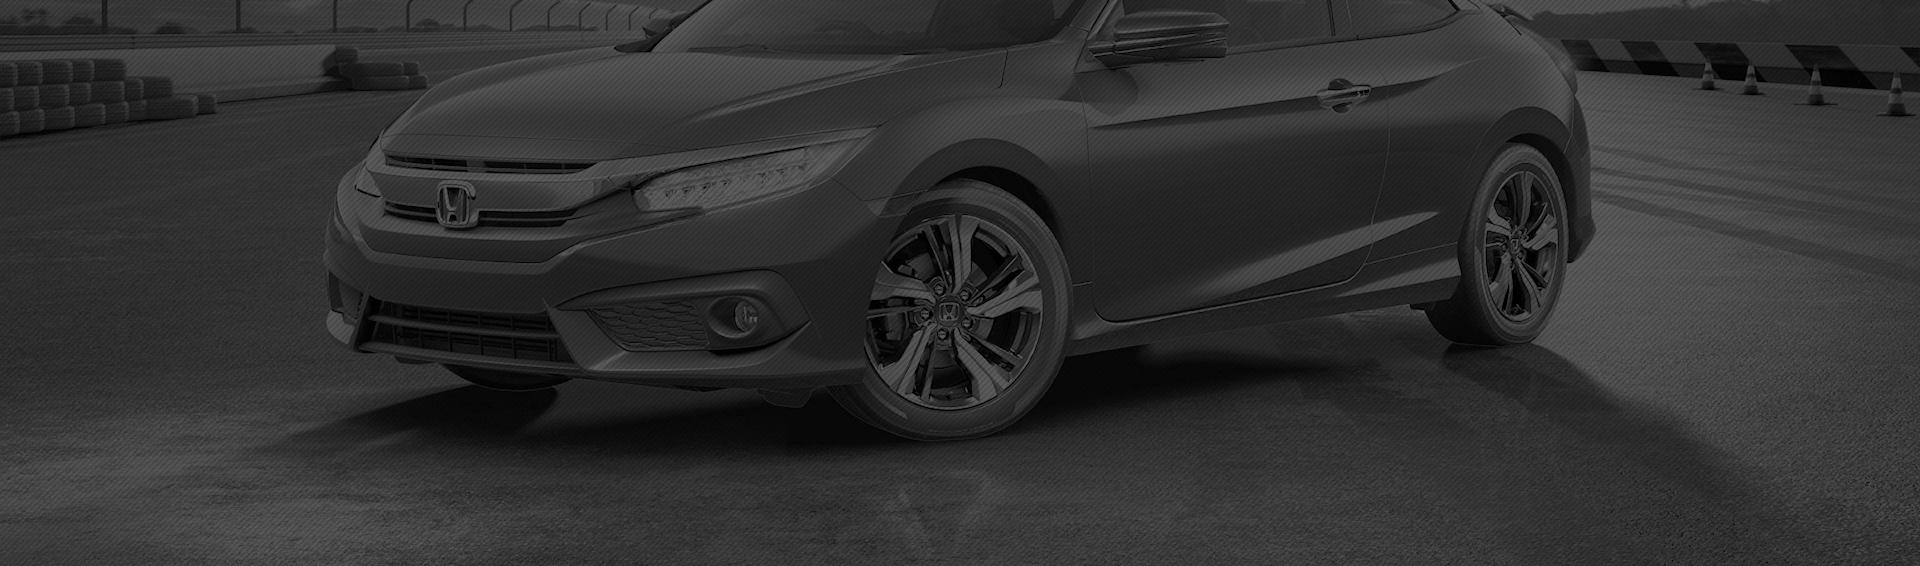 Craigslist Visalia Cars By Owner - 2018-2019 New Car ...